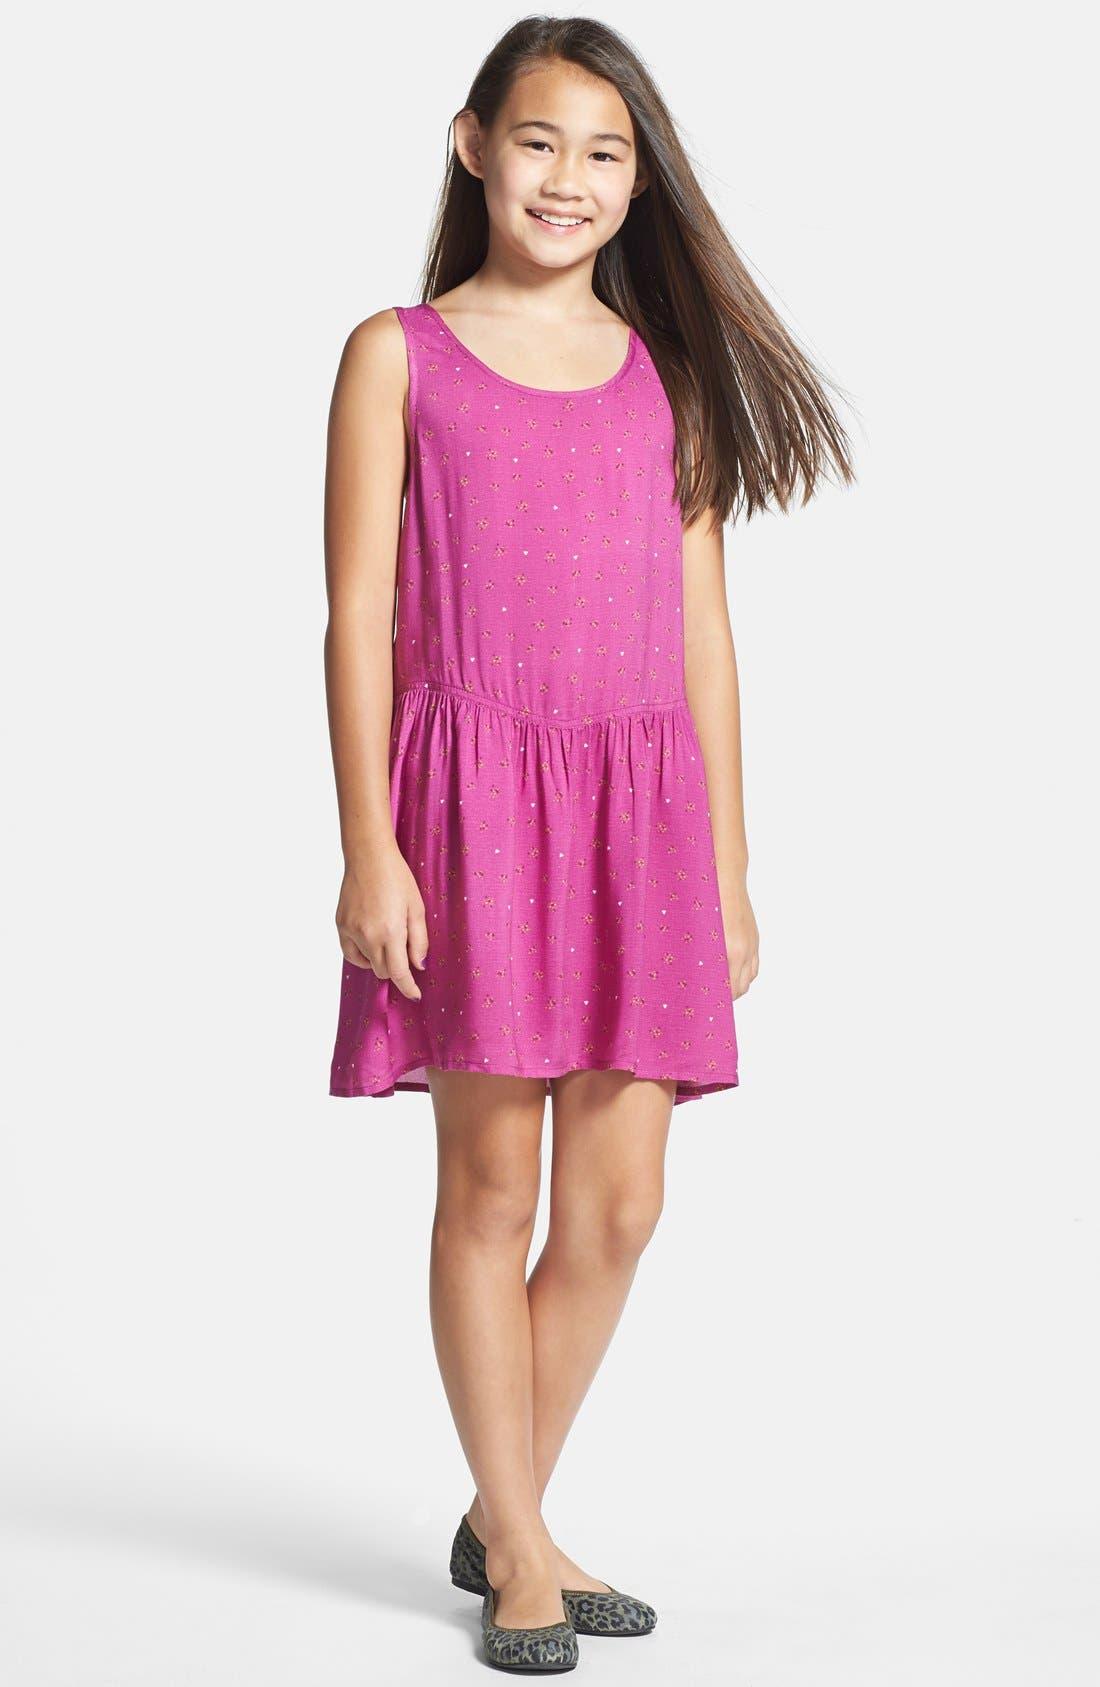 Alternate Image 1 Selected - Tucker + Tate 'Krissi' Sleeveless Dress (Big Girls)